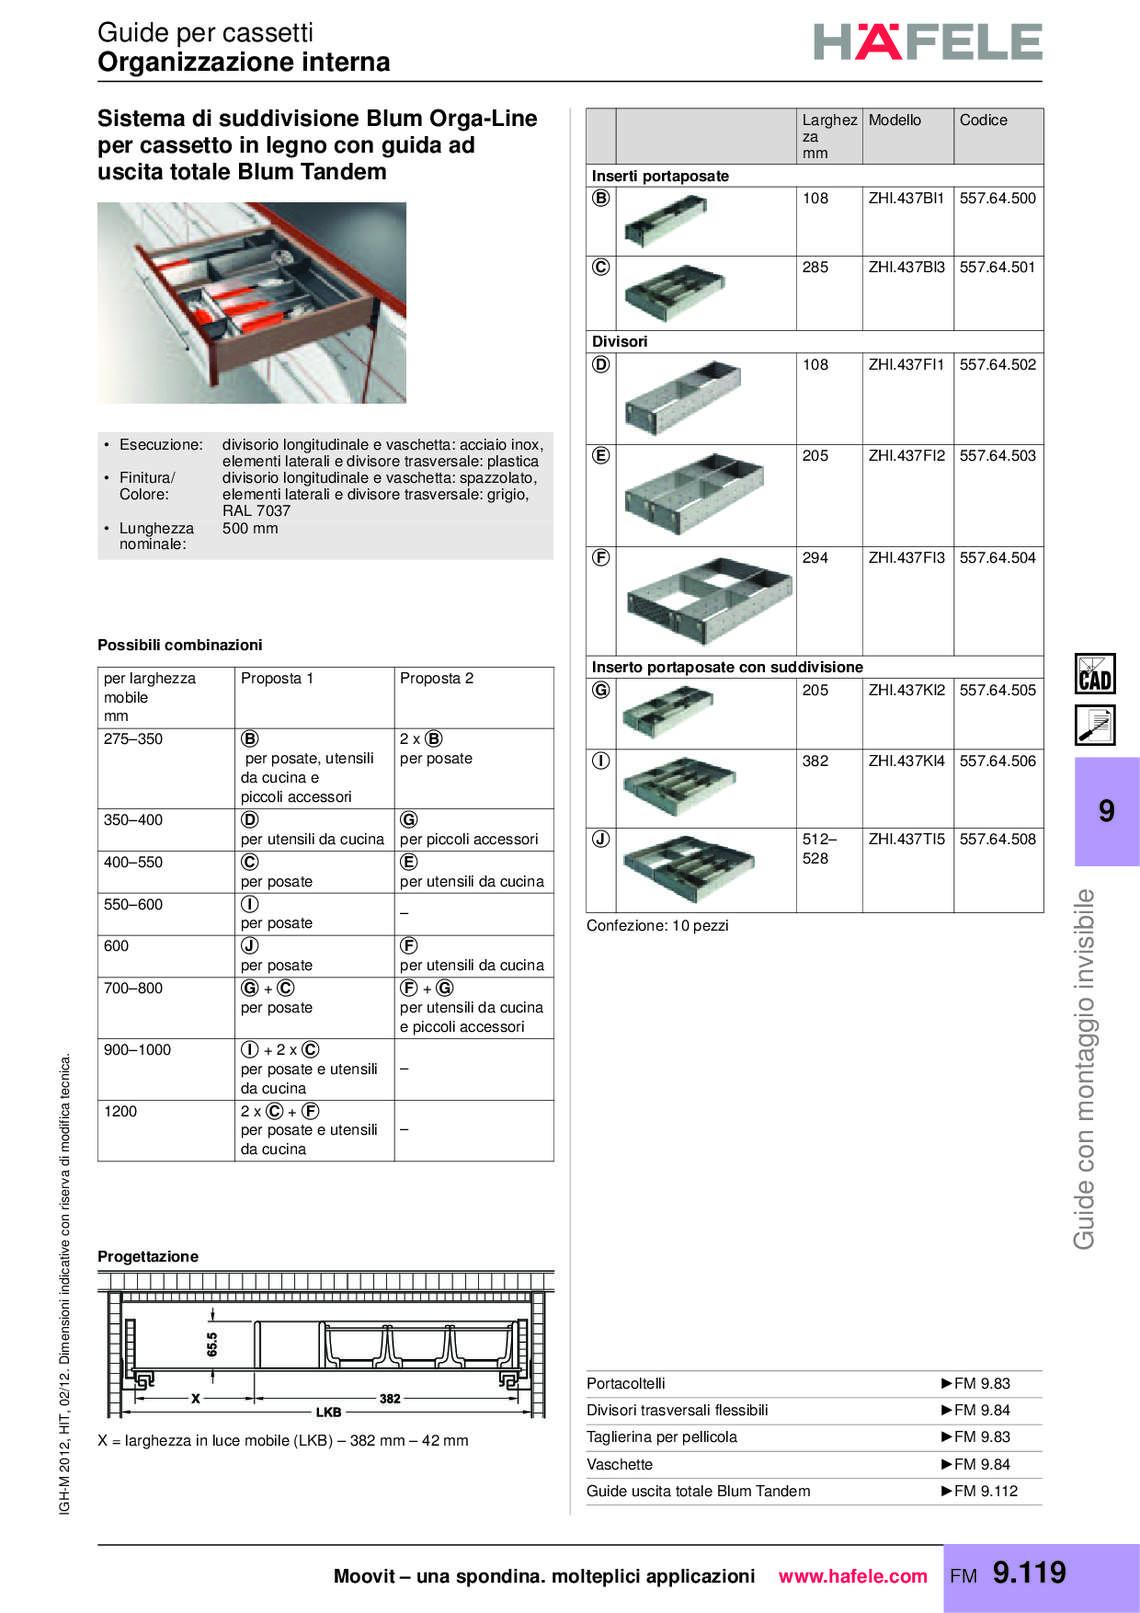 hafele-spondine-e-guide-per-mobili_40_170.jpg